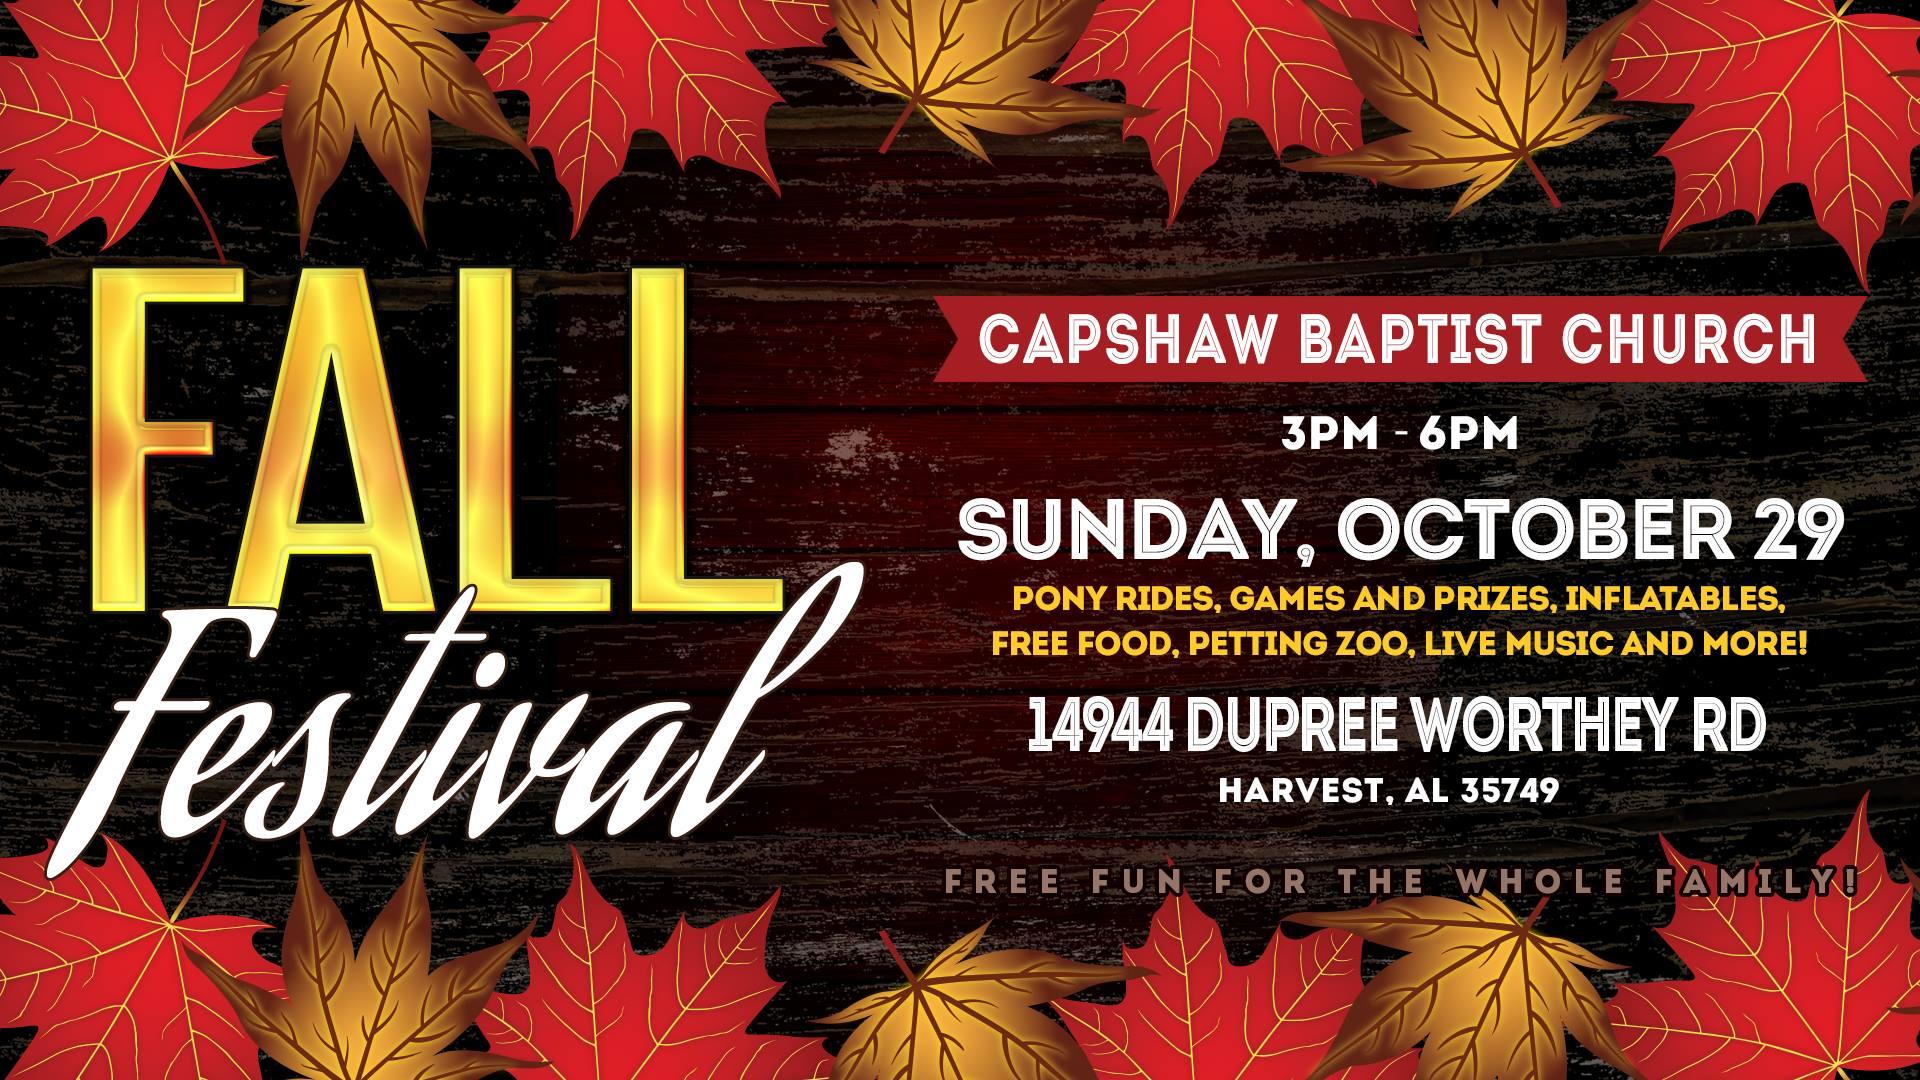 Capshaw Baptist Church Fall Festival